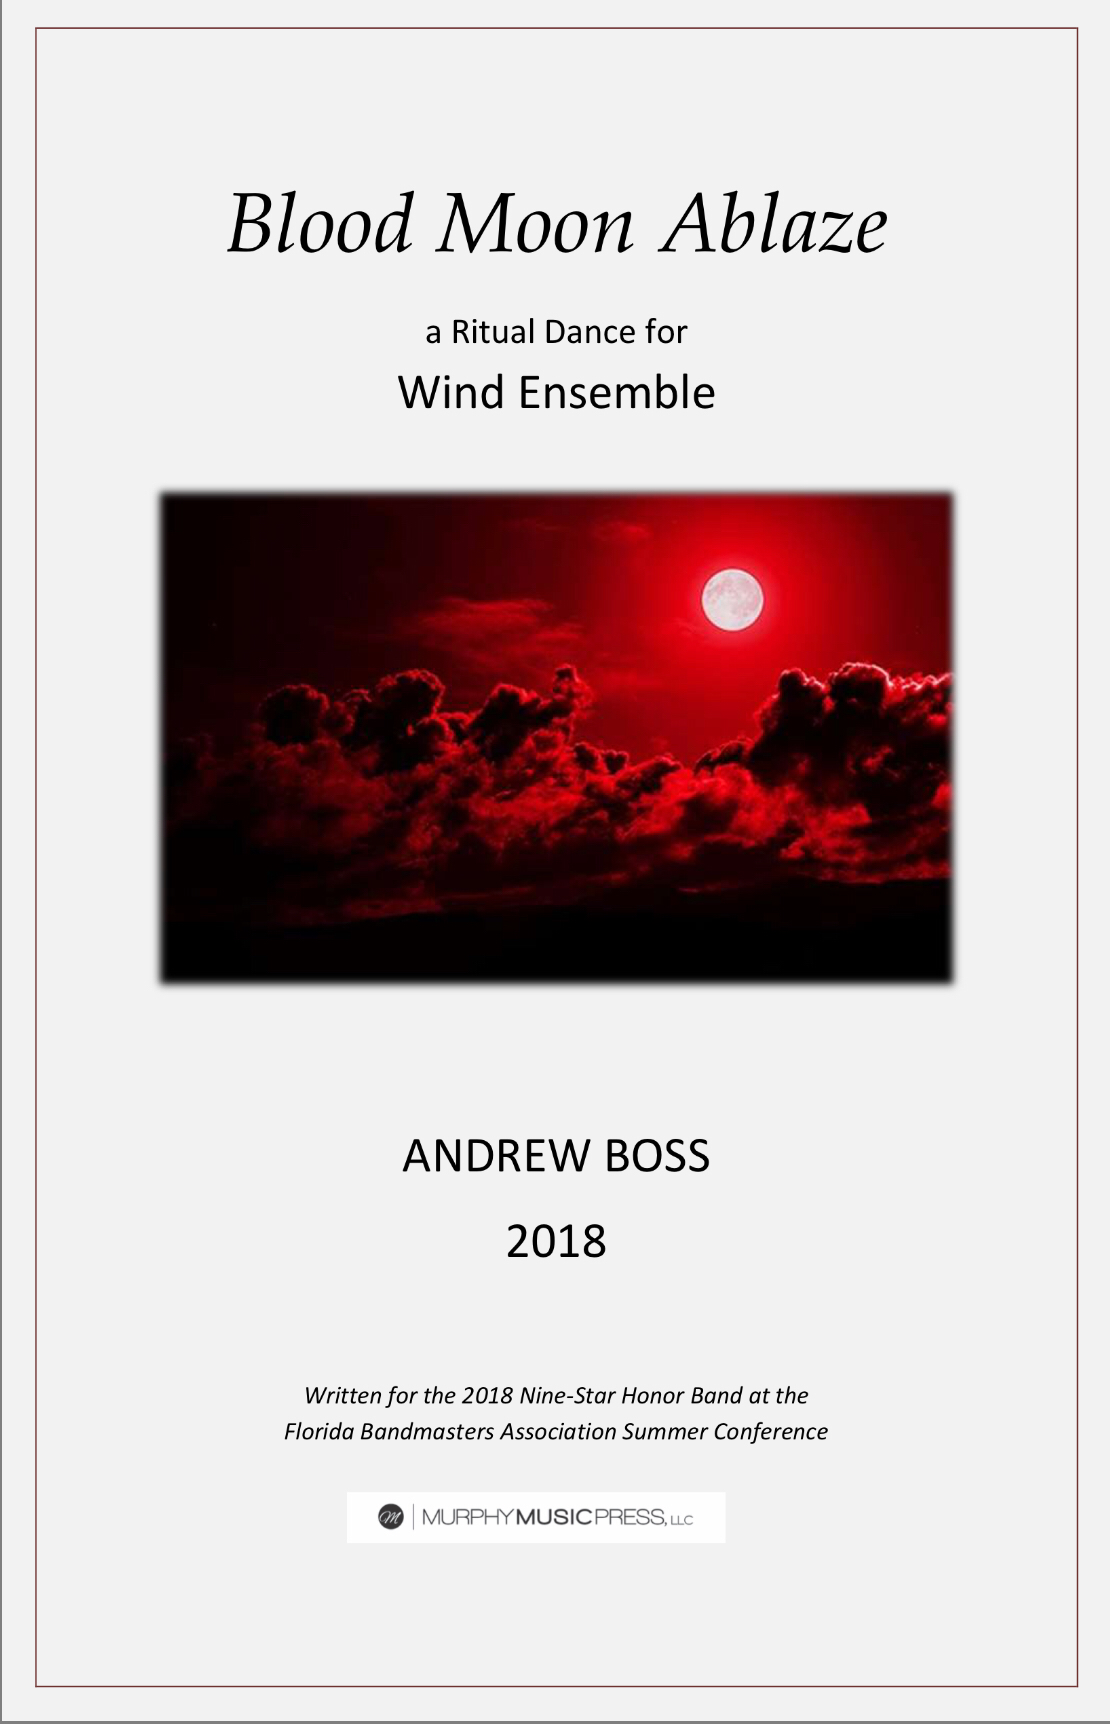 Blood Moon Ablaze (PDF Version) by Andrew Boss